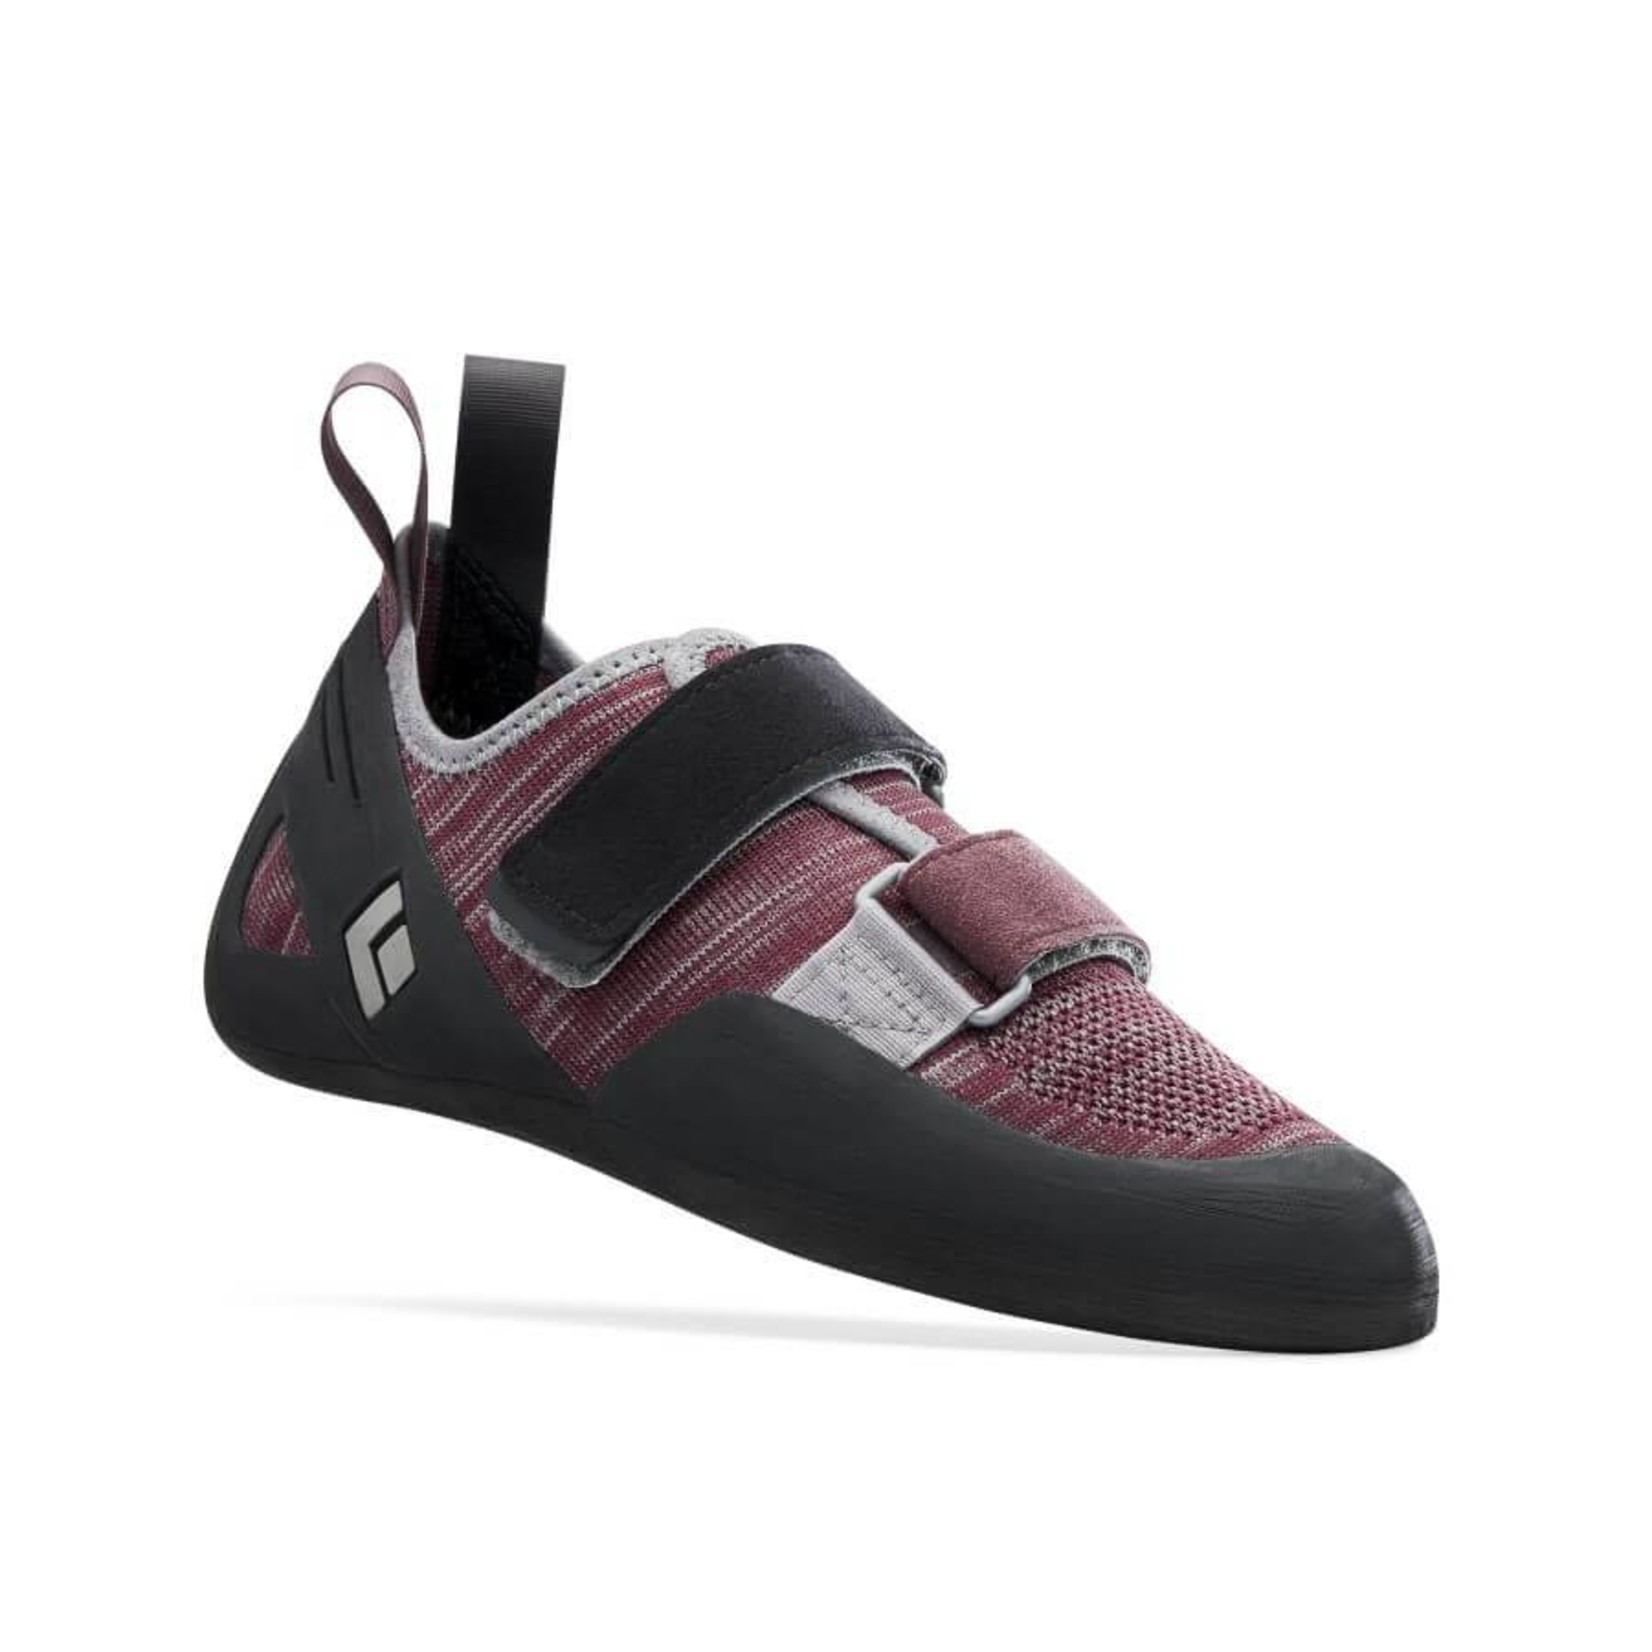 Black Diamond Black Diamond Momentum Climbing Shoes - Women